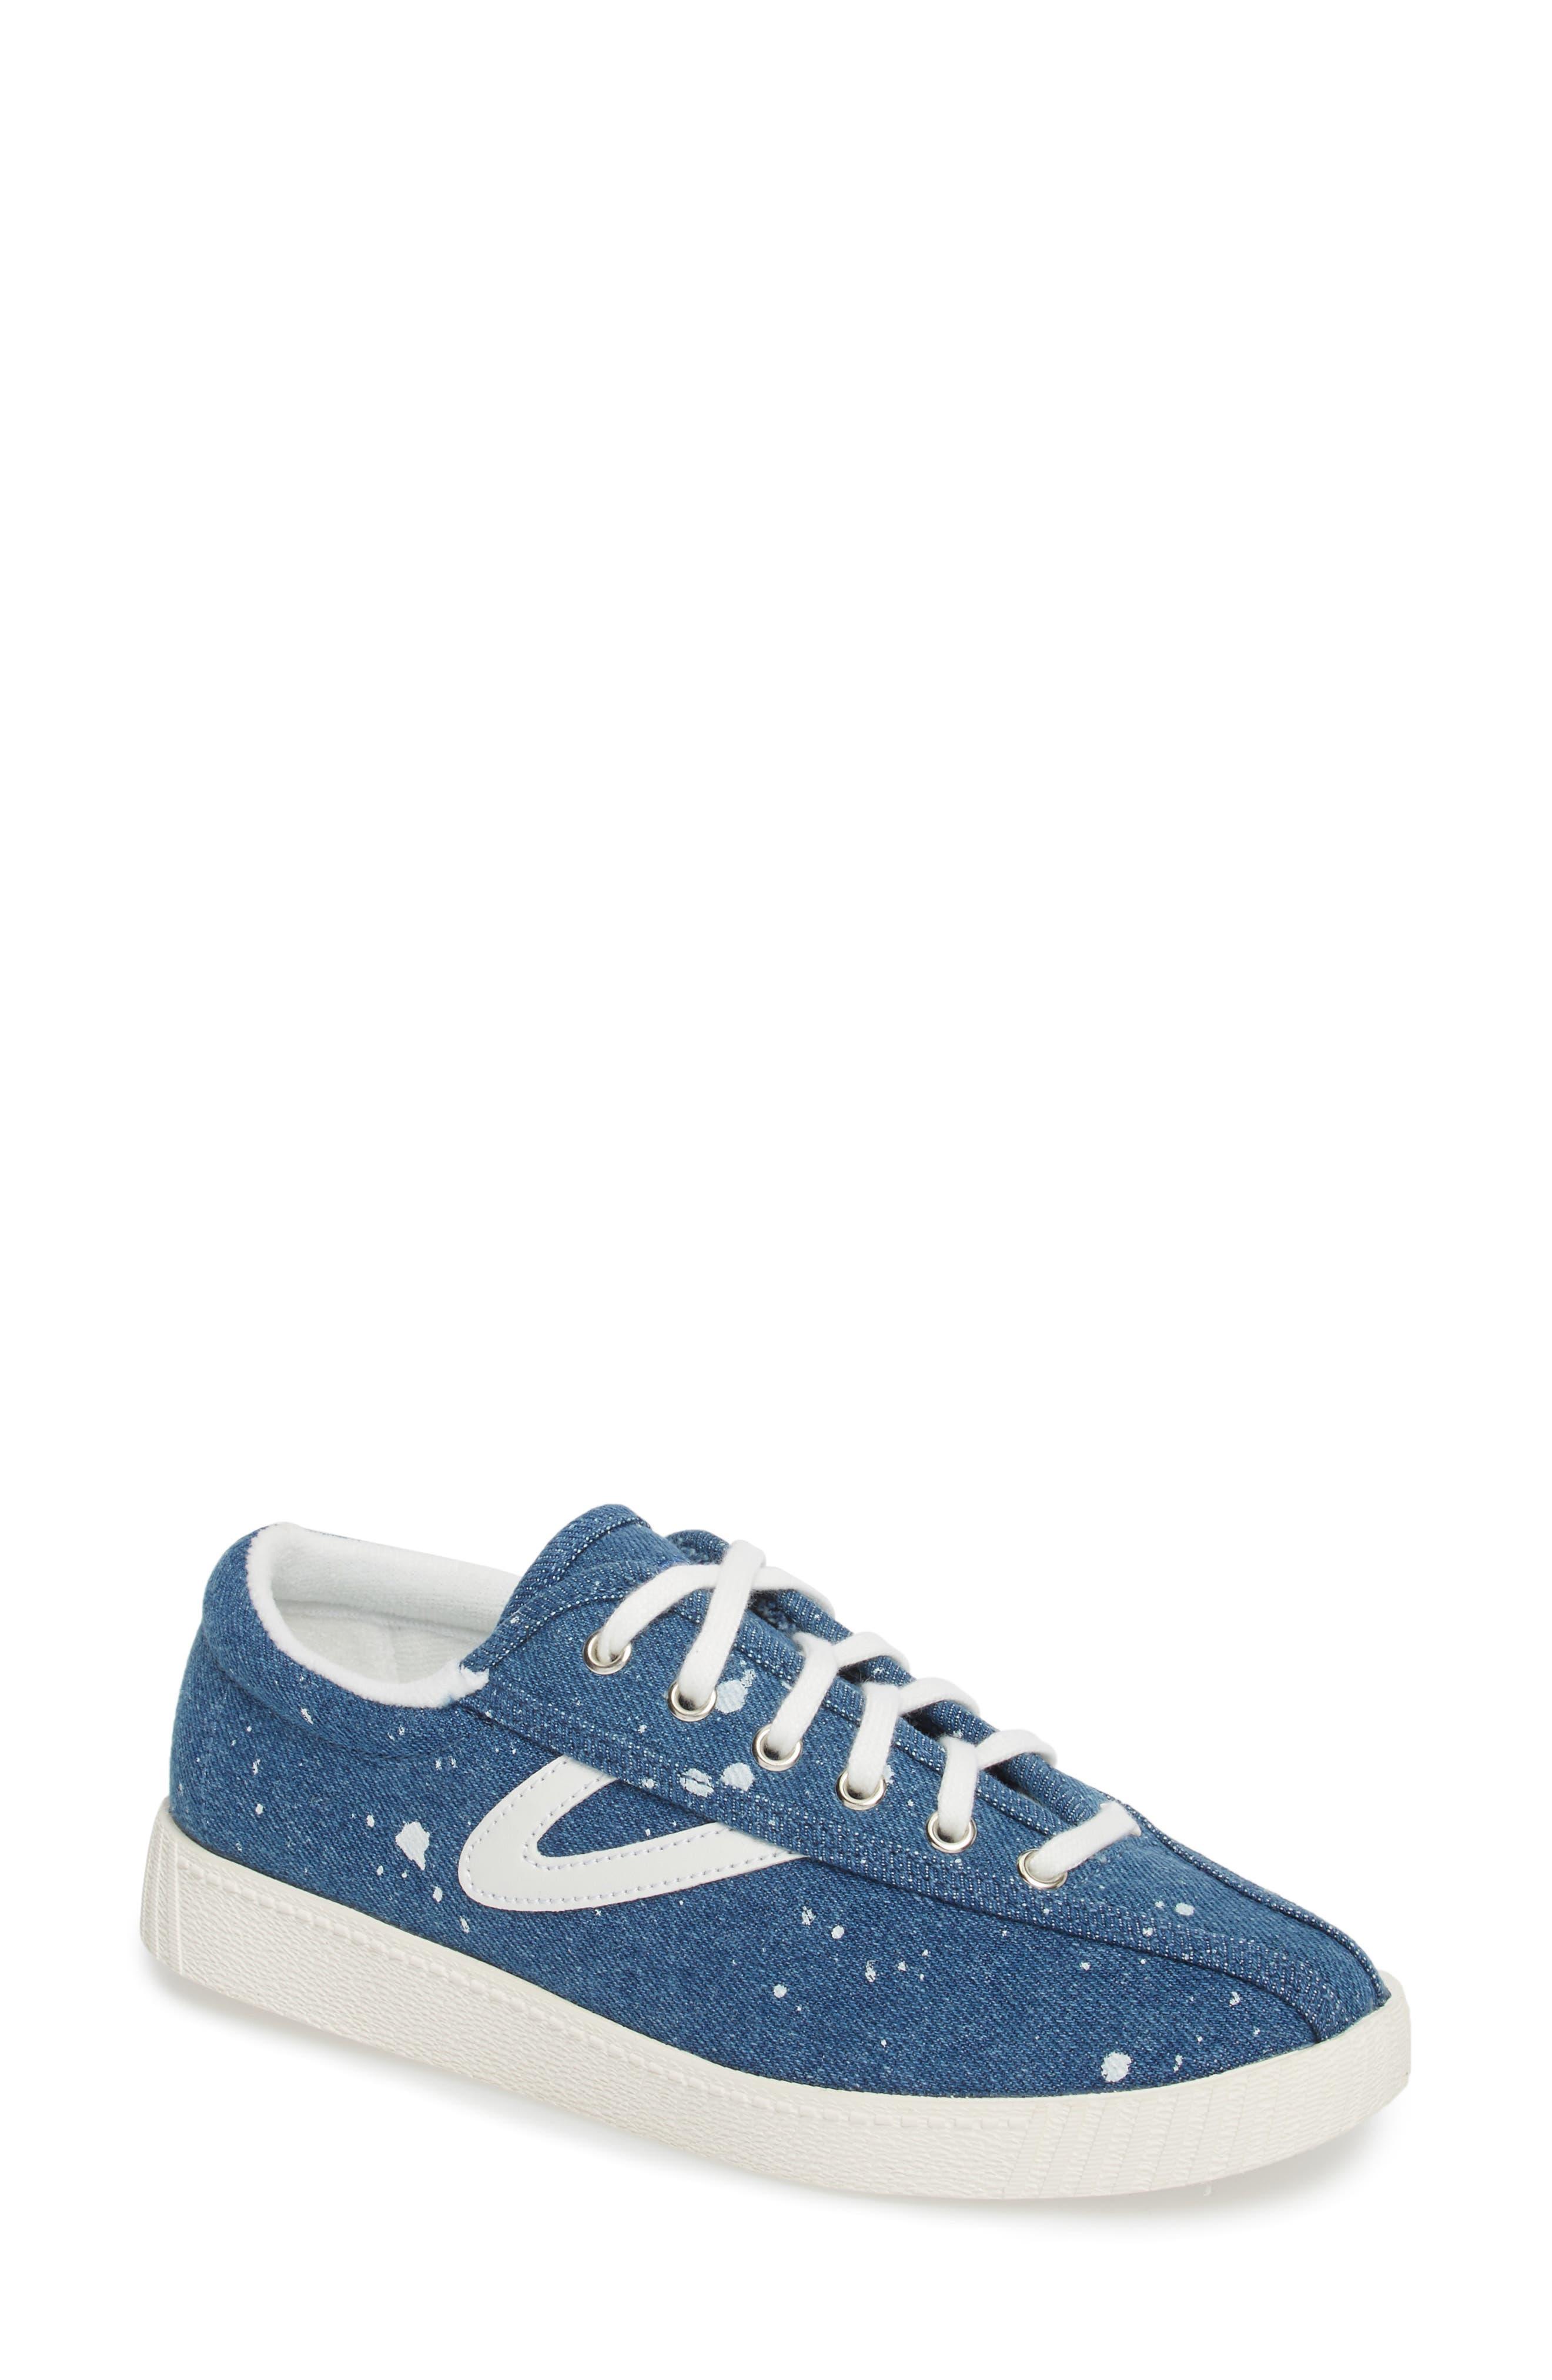 Nylite Plus Sneaker,                             Main thumbnail 1, color,                             Blue Fabric